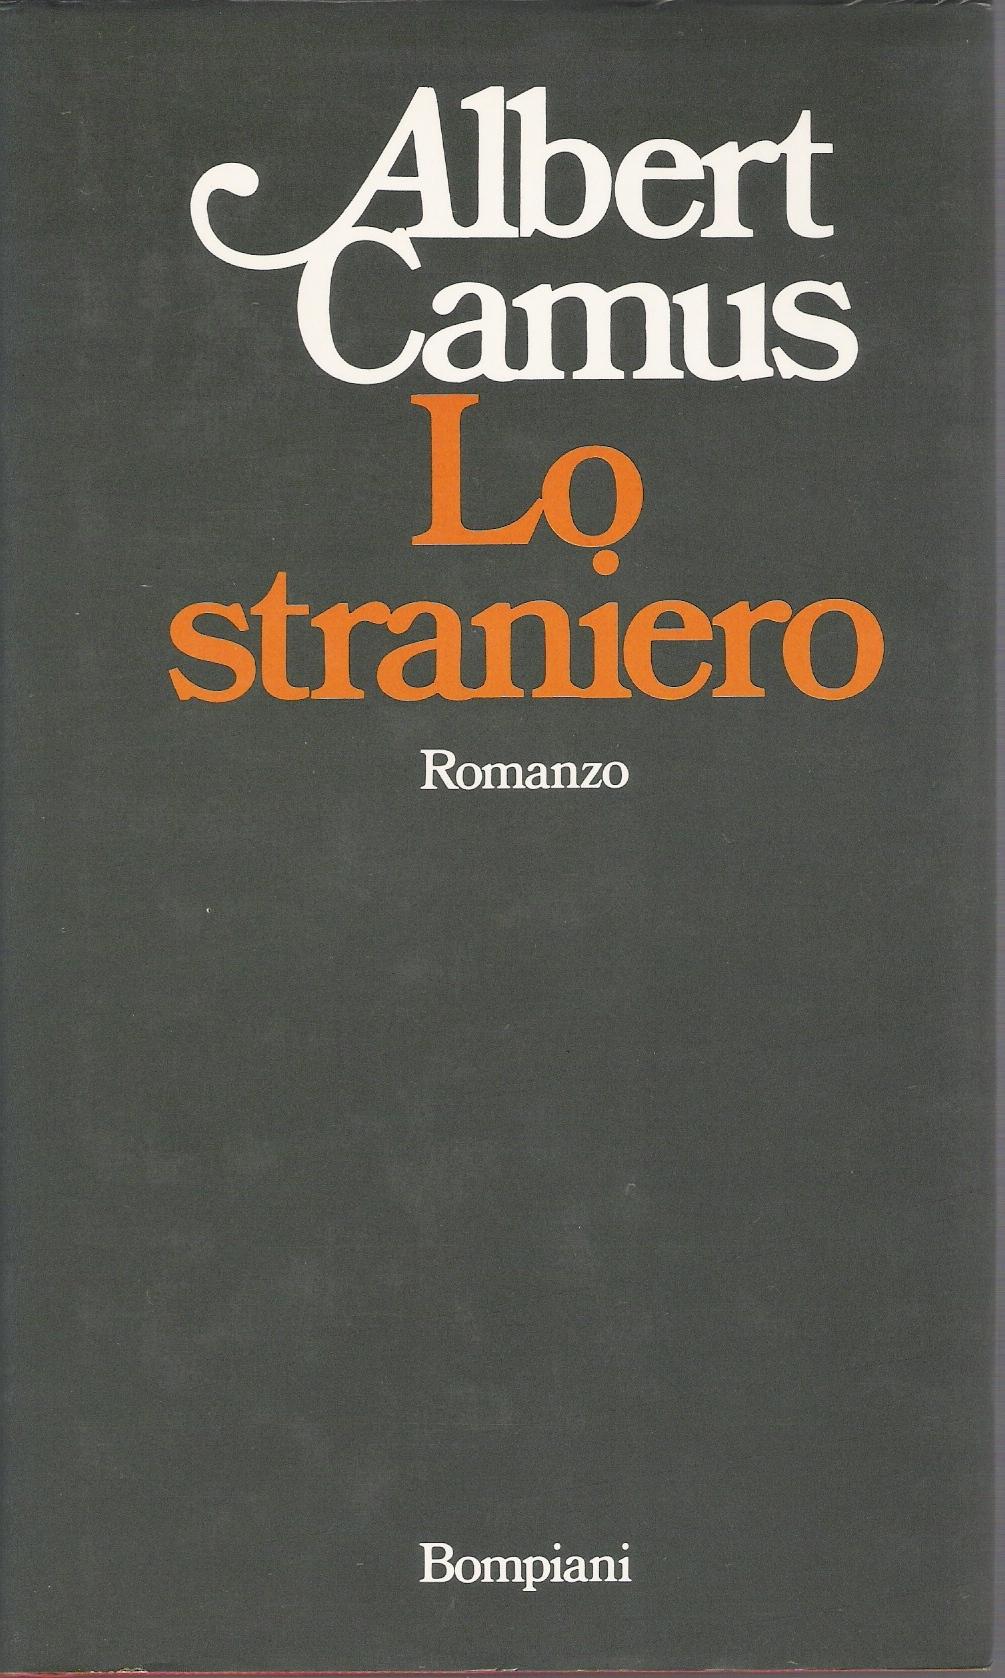 Lo scrittore Albert Camus